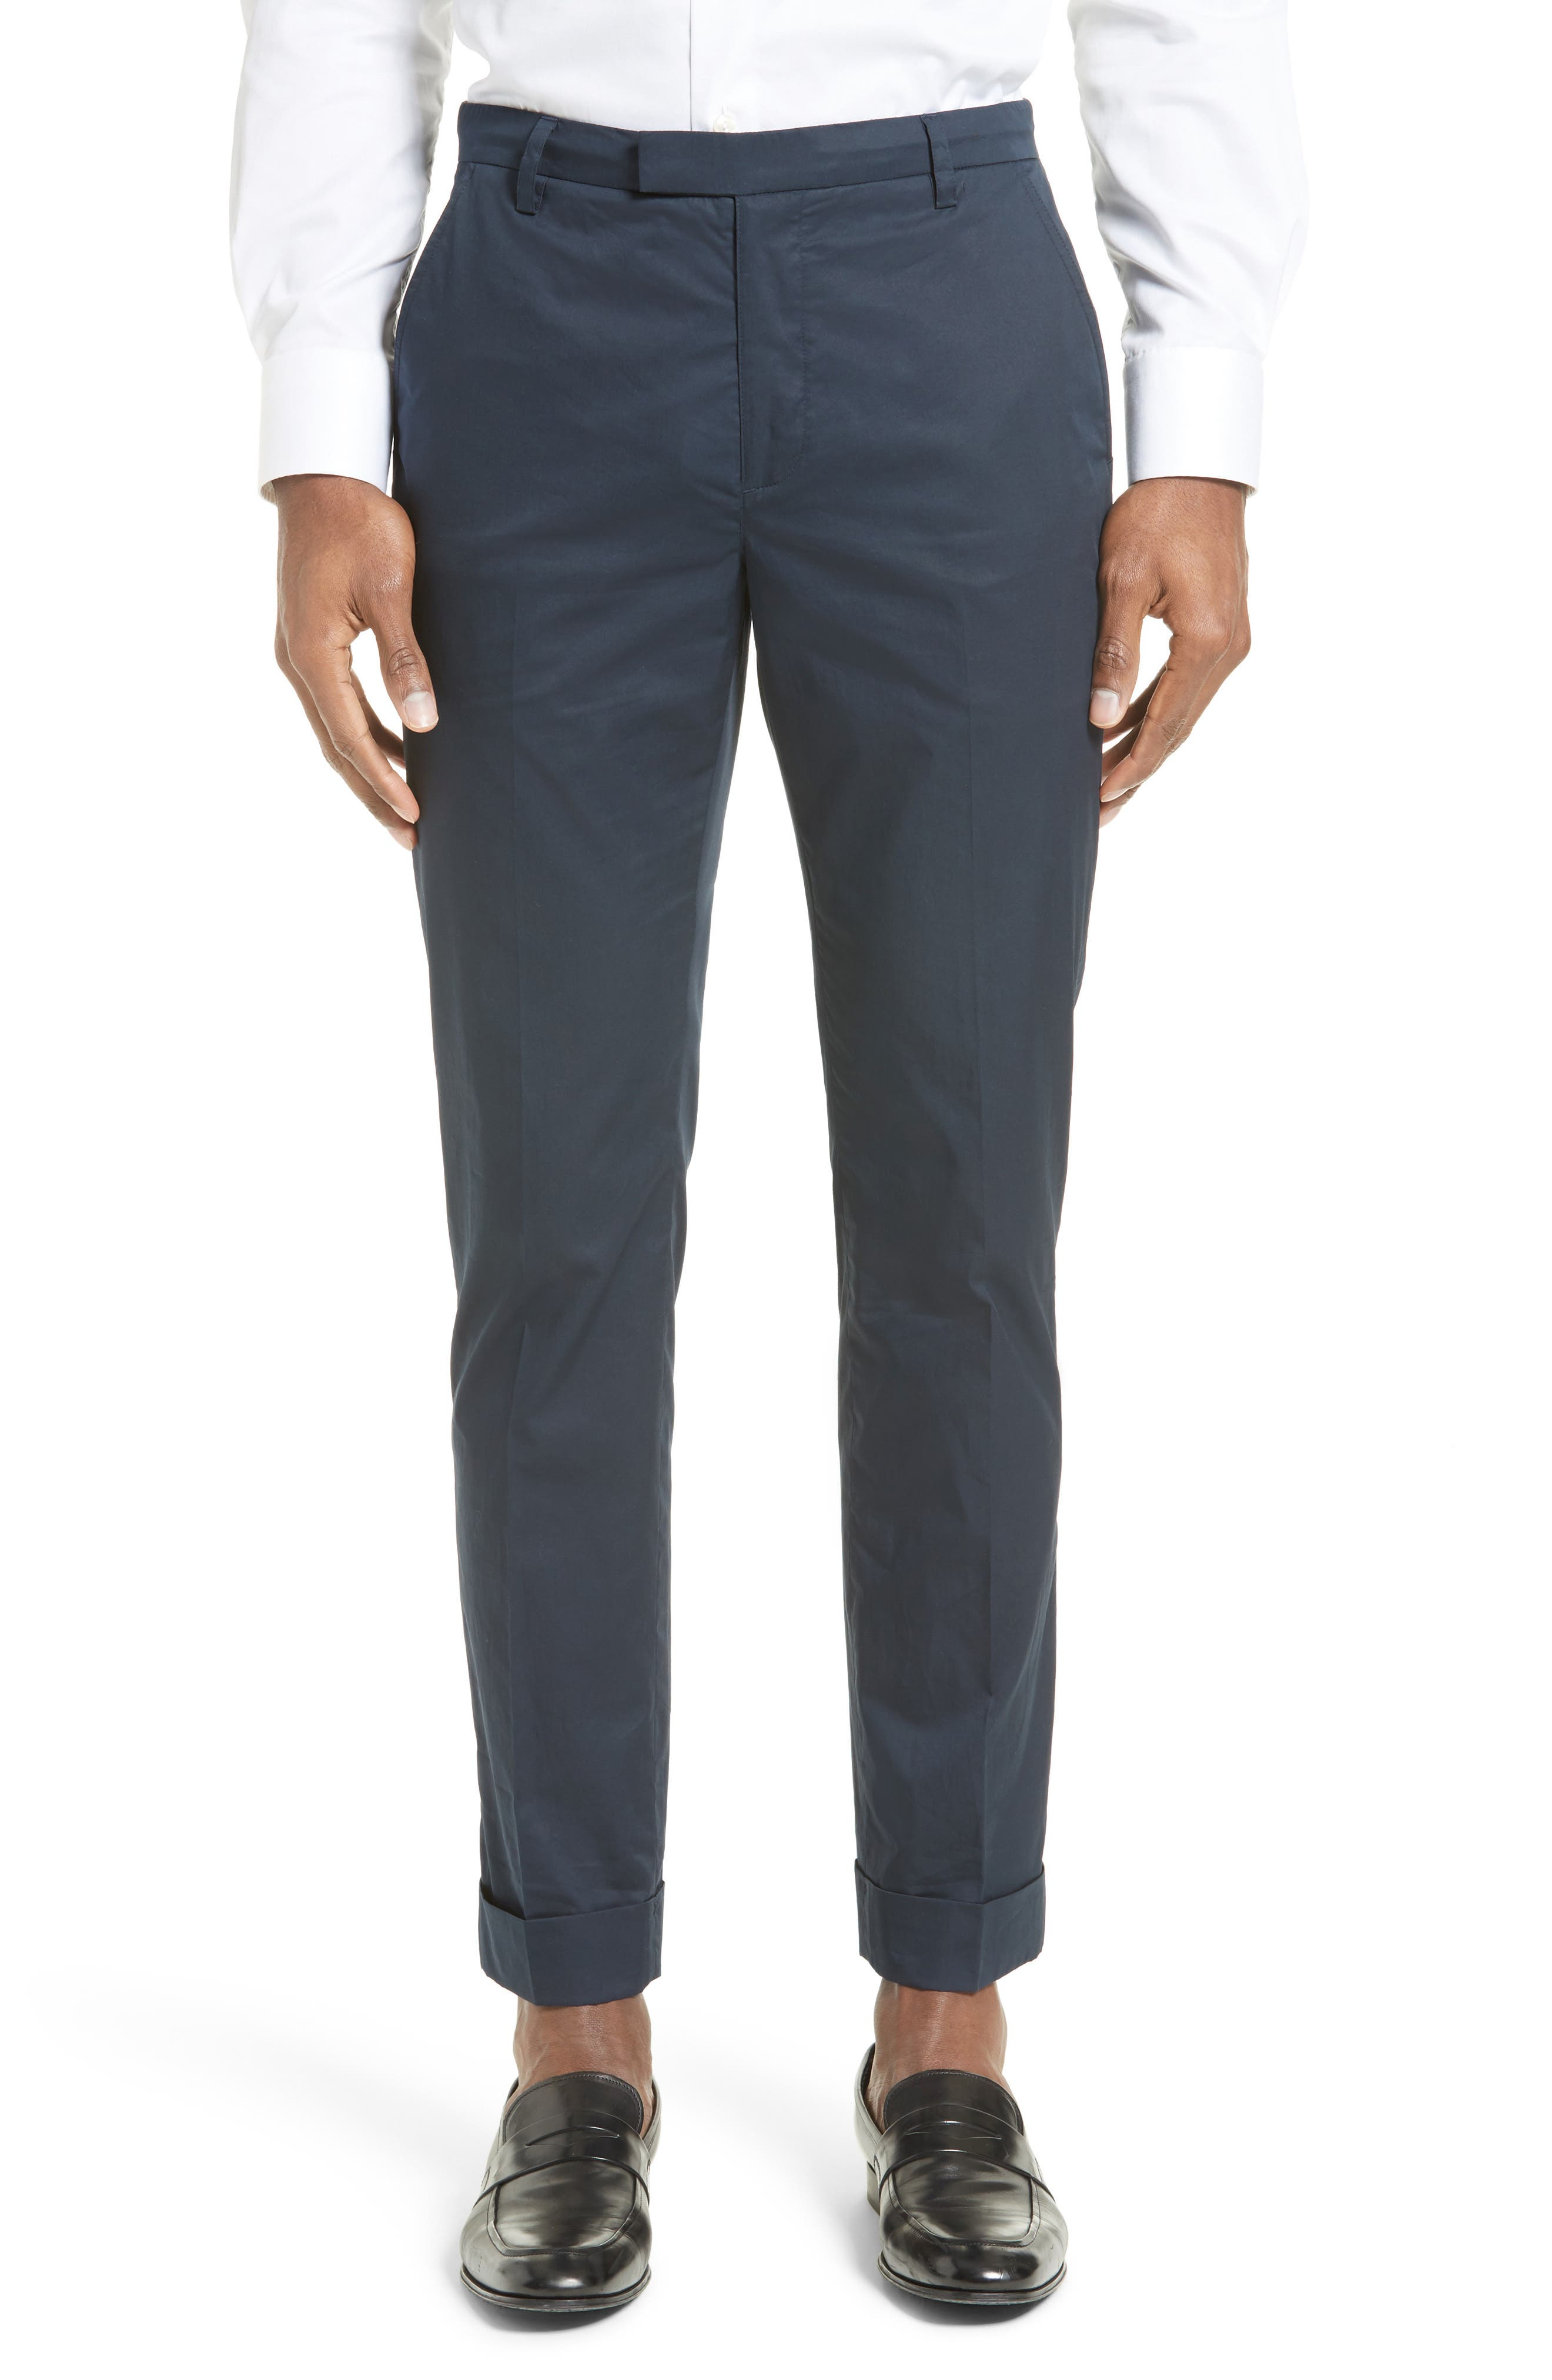 Alternate Image 1 Selected - ATM Anthony Thomas Melillo Cuffed Cotton Poplin Pants